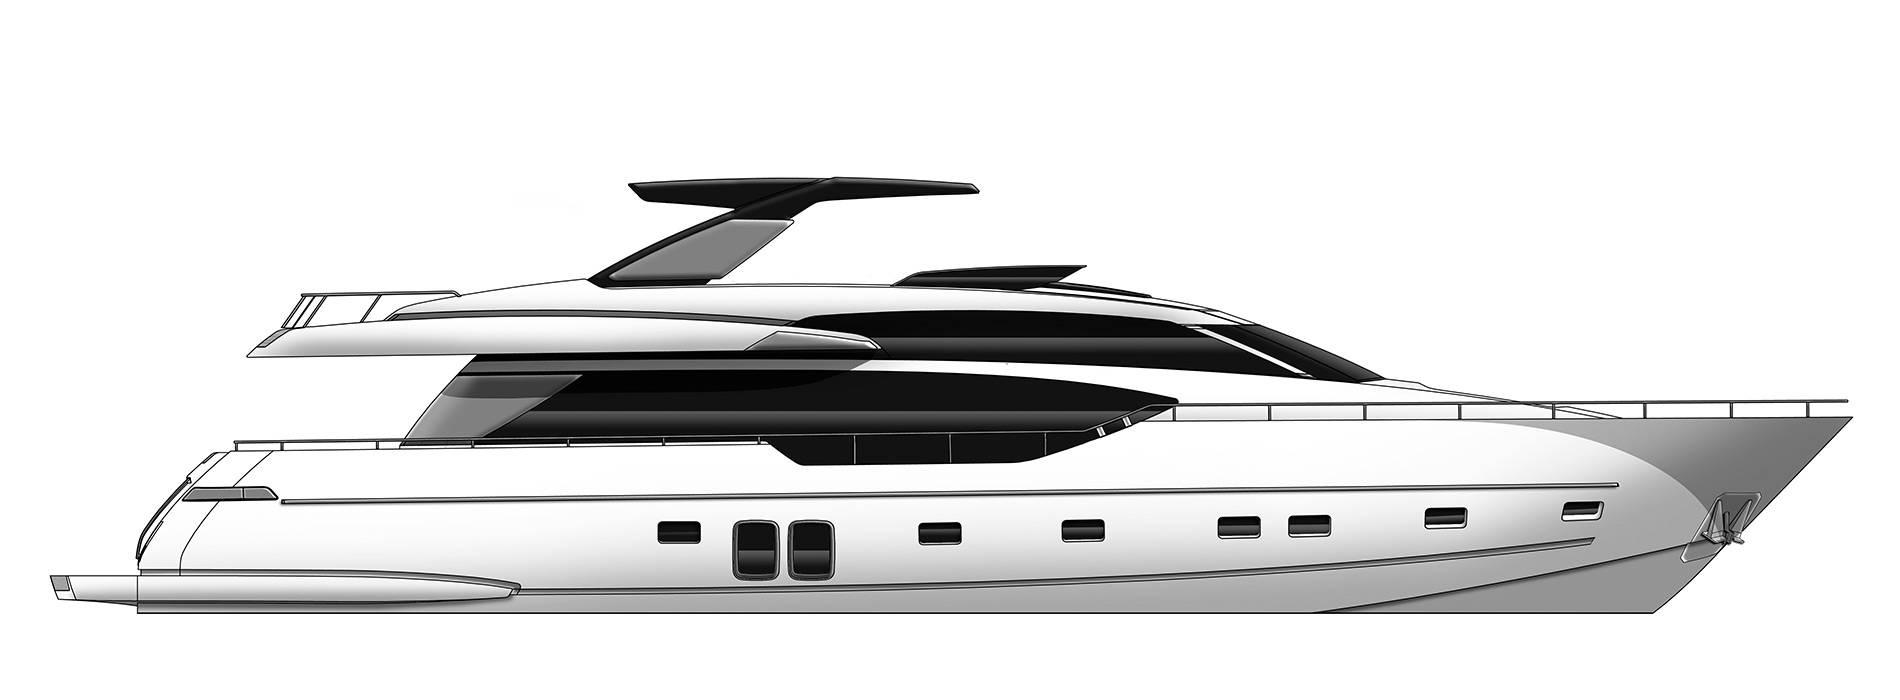 Sanlorenzo Yachts SL86 外观